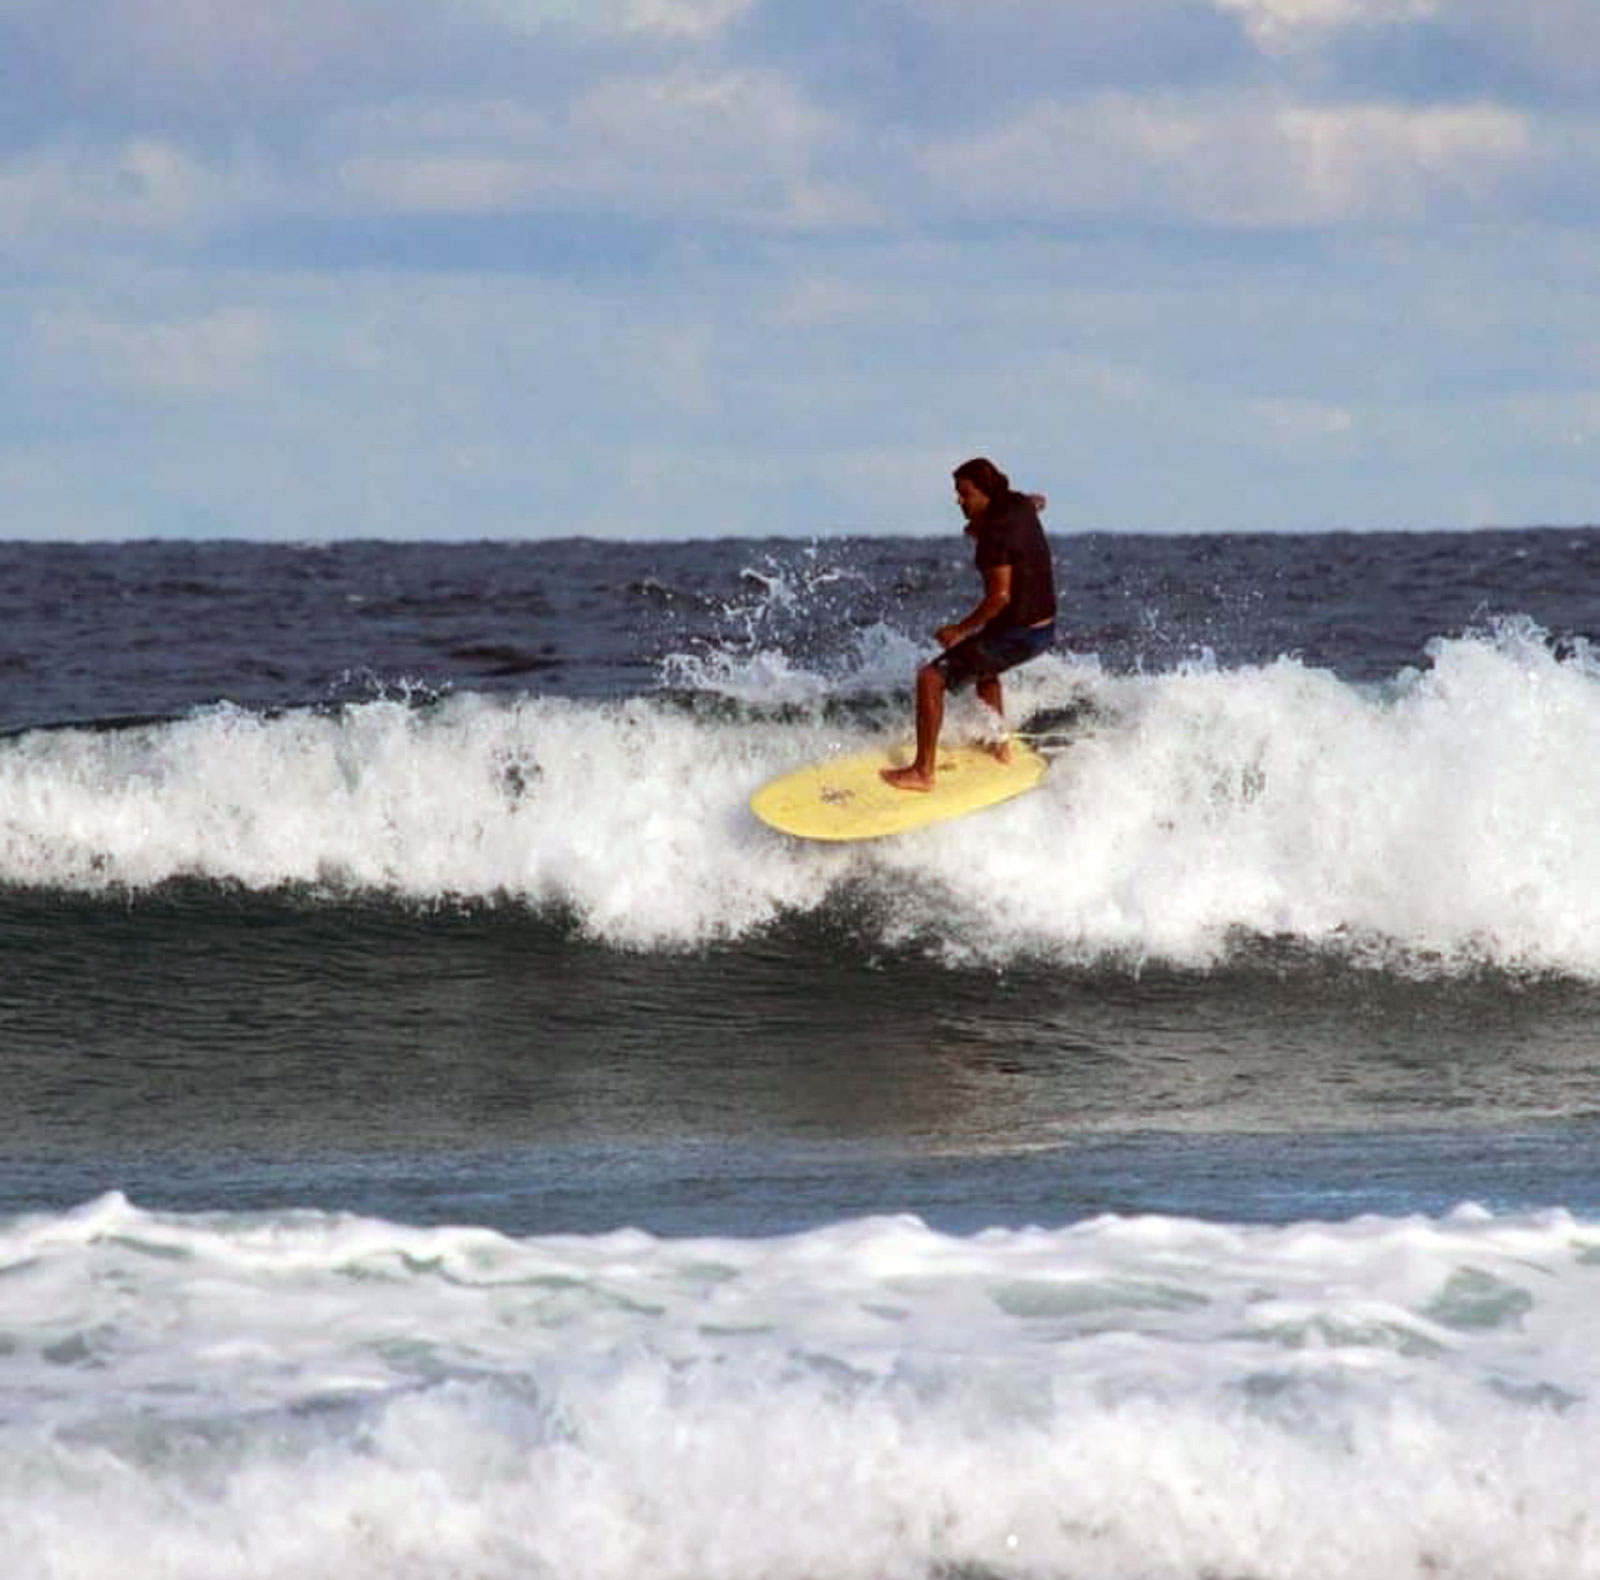 David Ramirez, Salina Cruz, Oaxaca, Mexico, October 2018 Las Palmeras Surf Camp